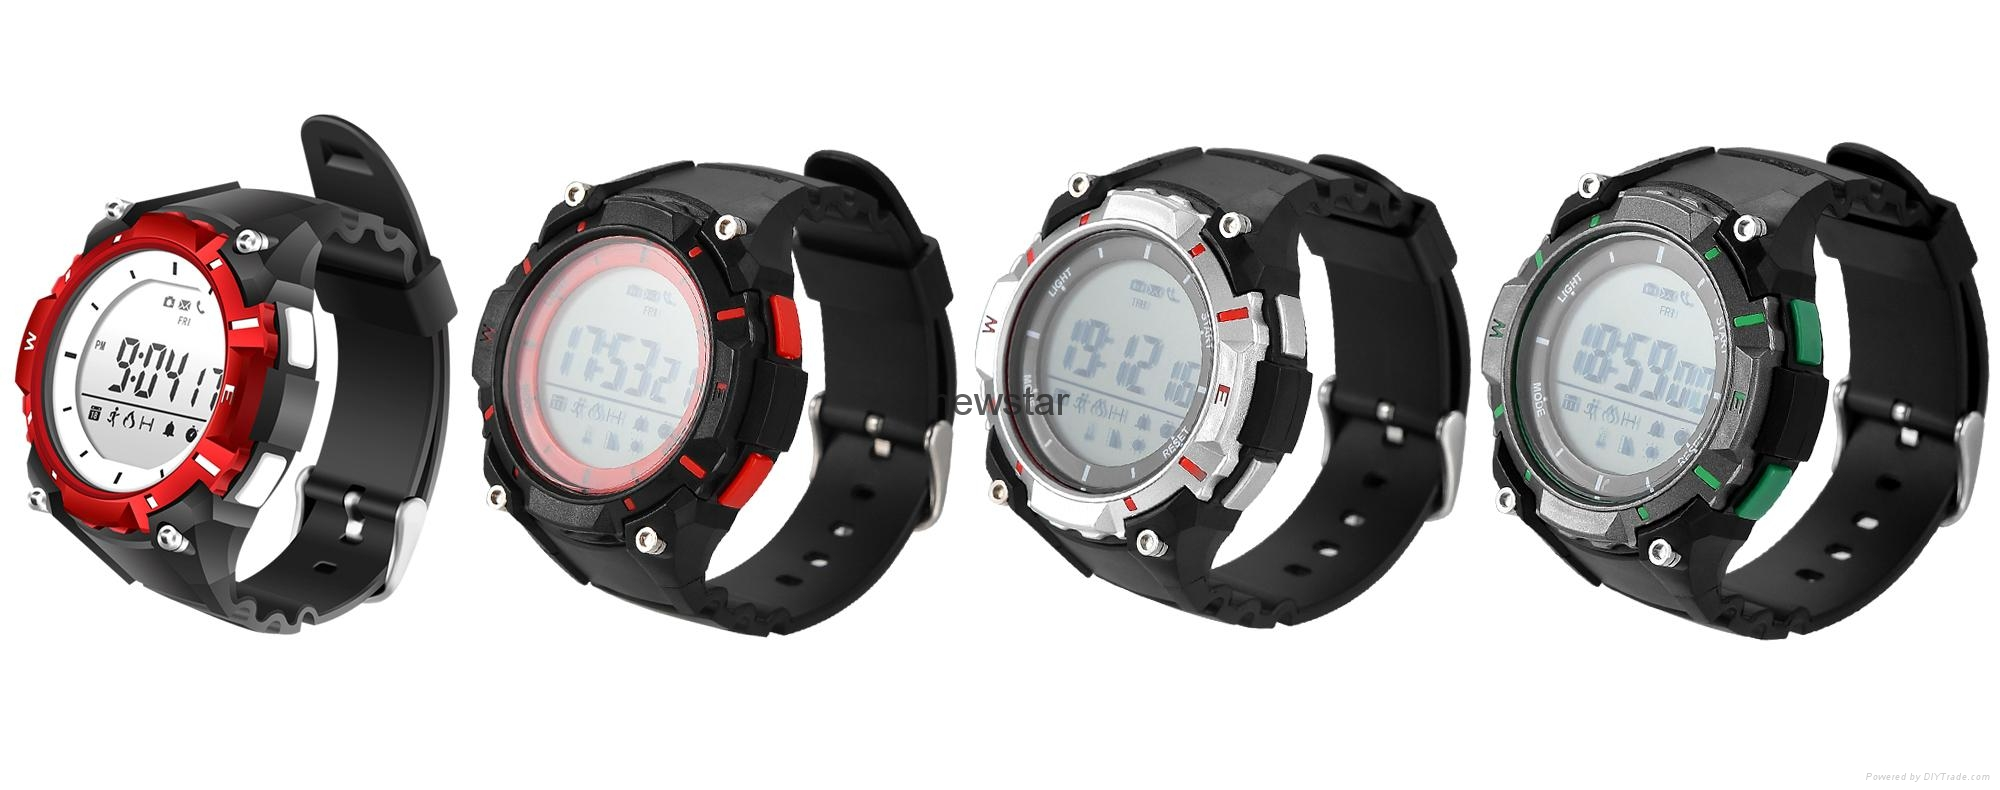 Bluetooth 30m water proof sport watch  4